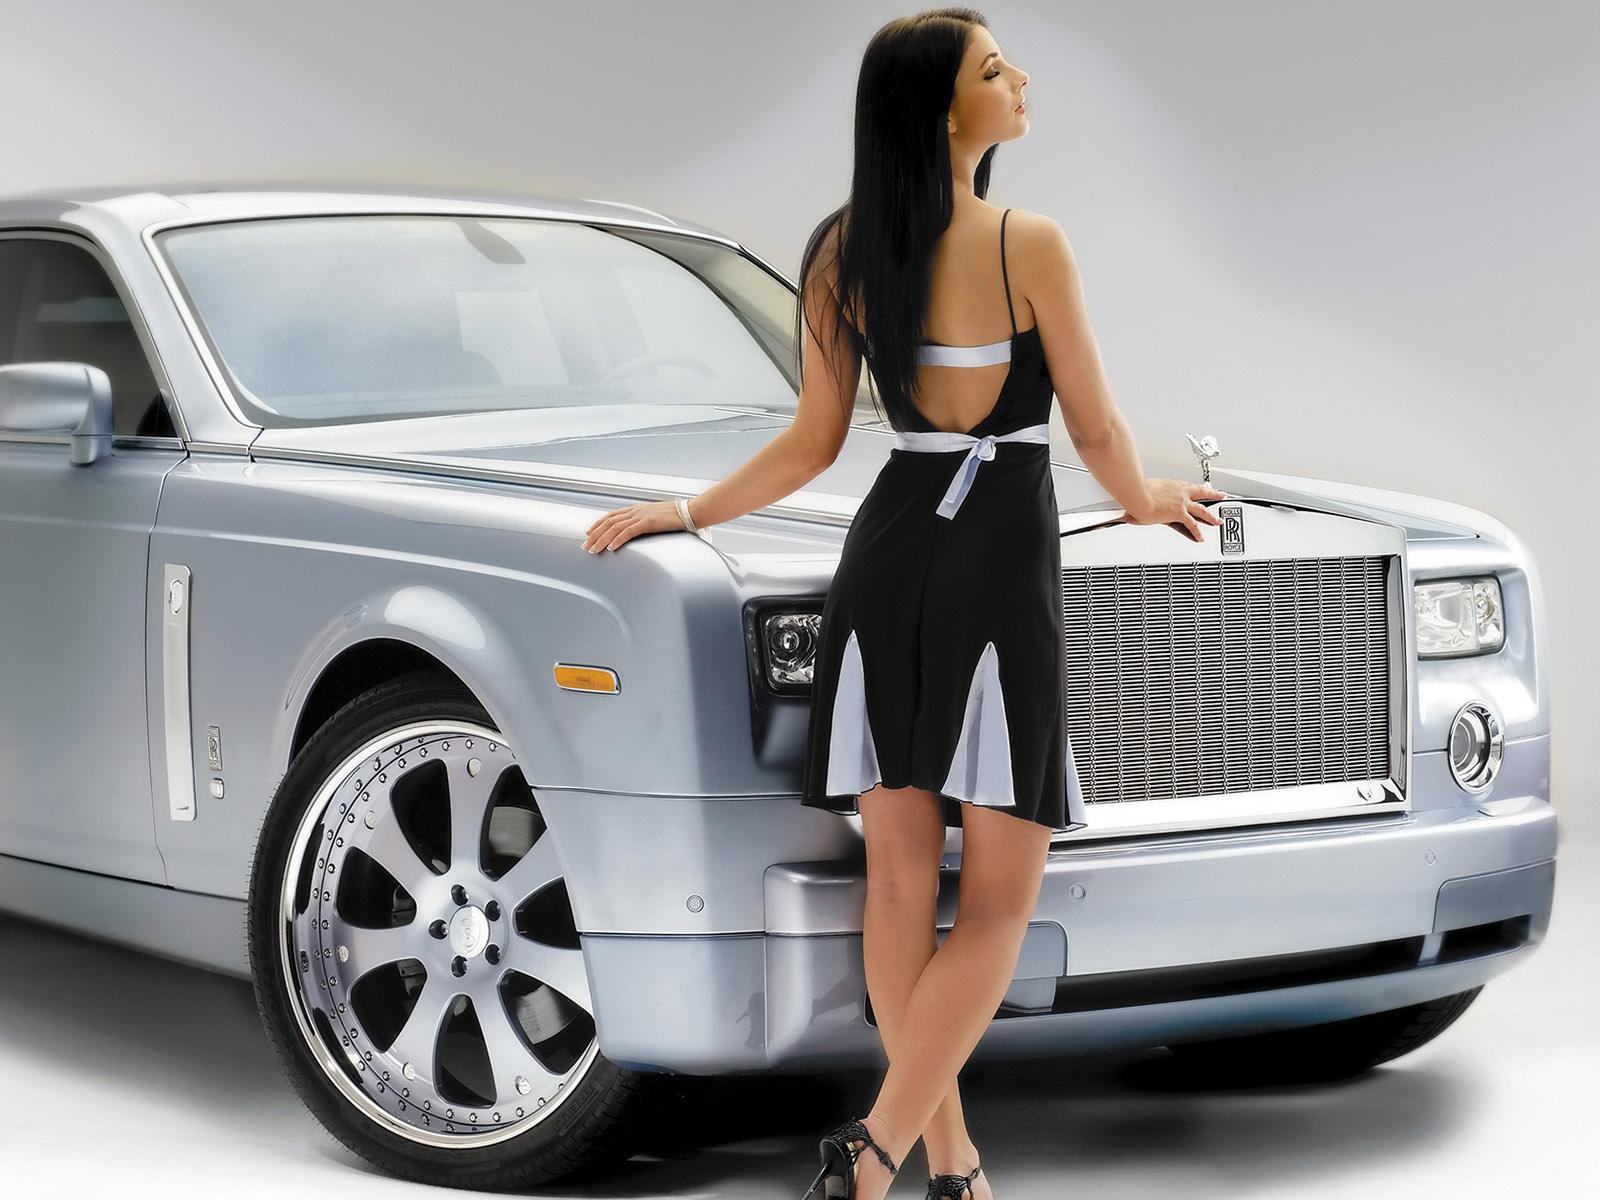 2008 Strut Rolls Royce Phantom Knightsbridge Collection